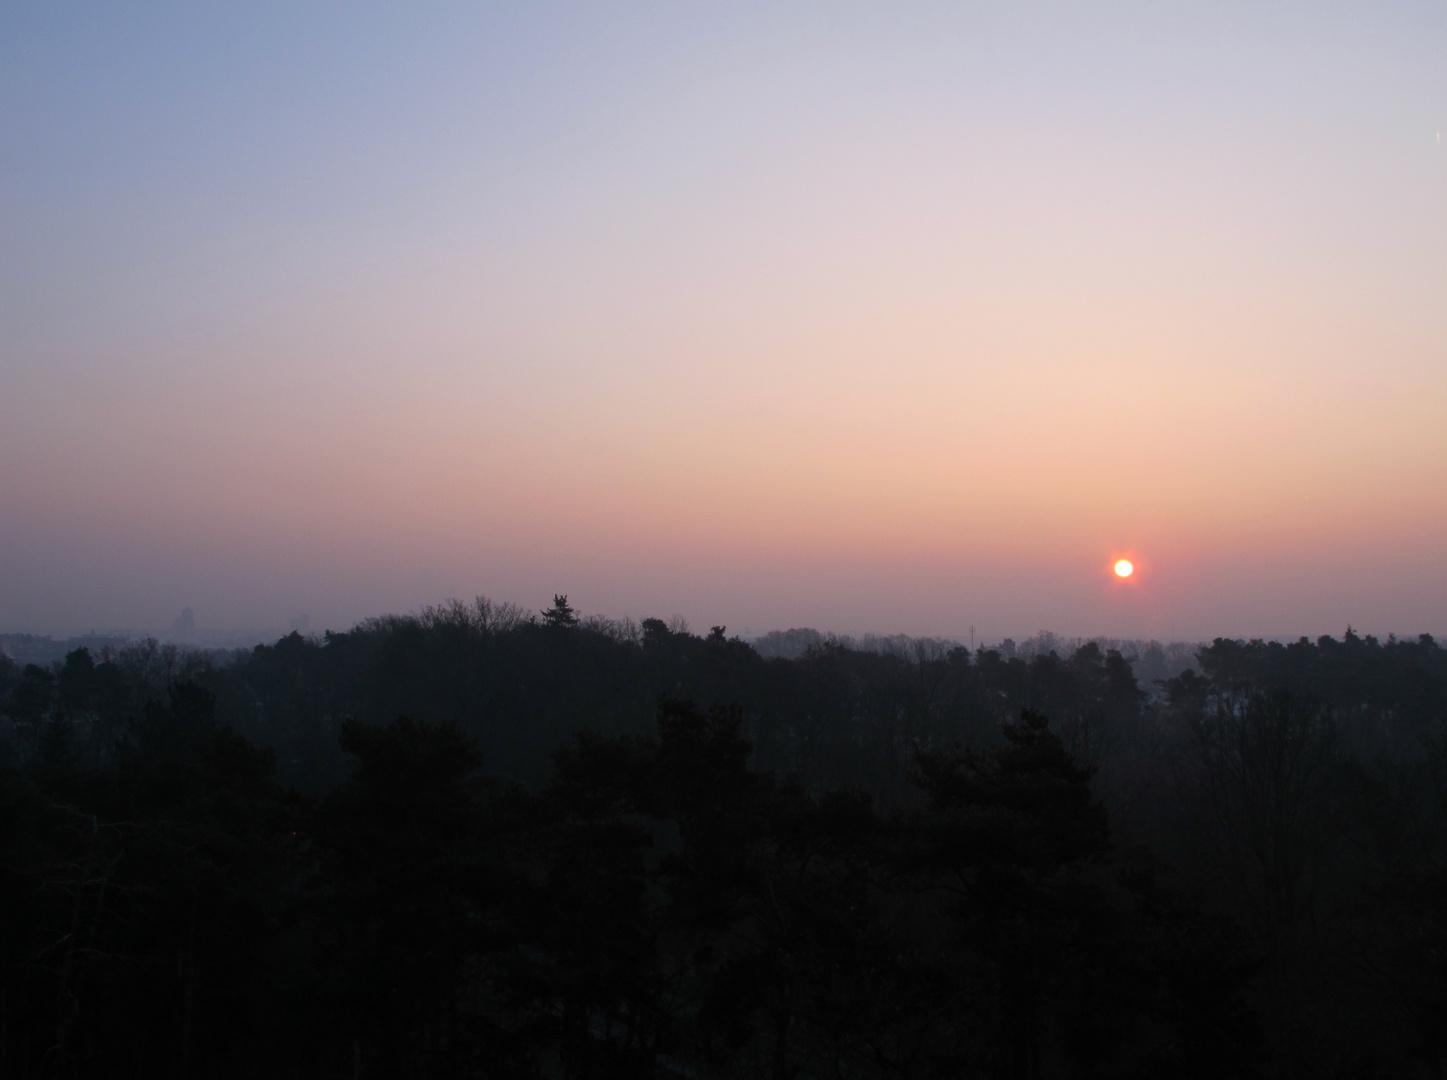 Sonnenaufgang 23.02.2011